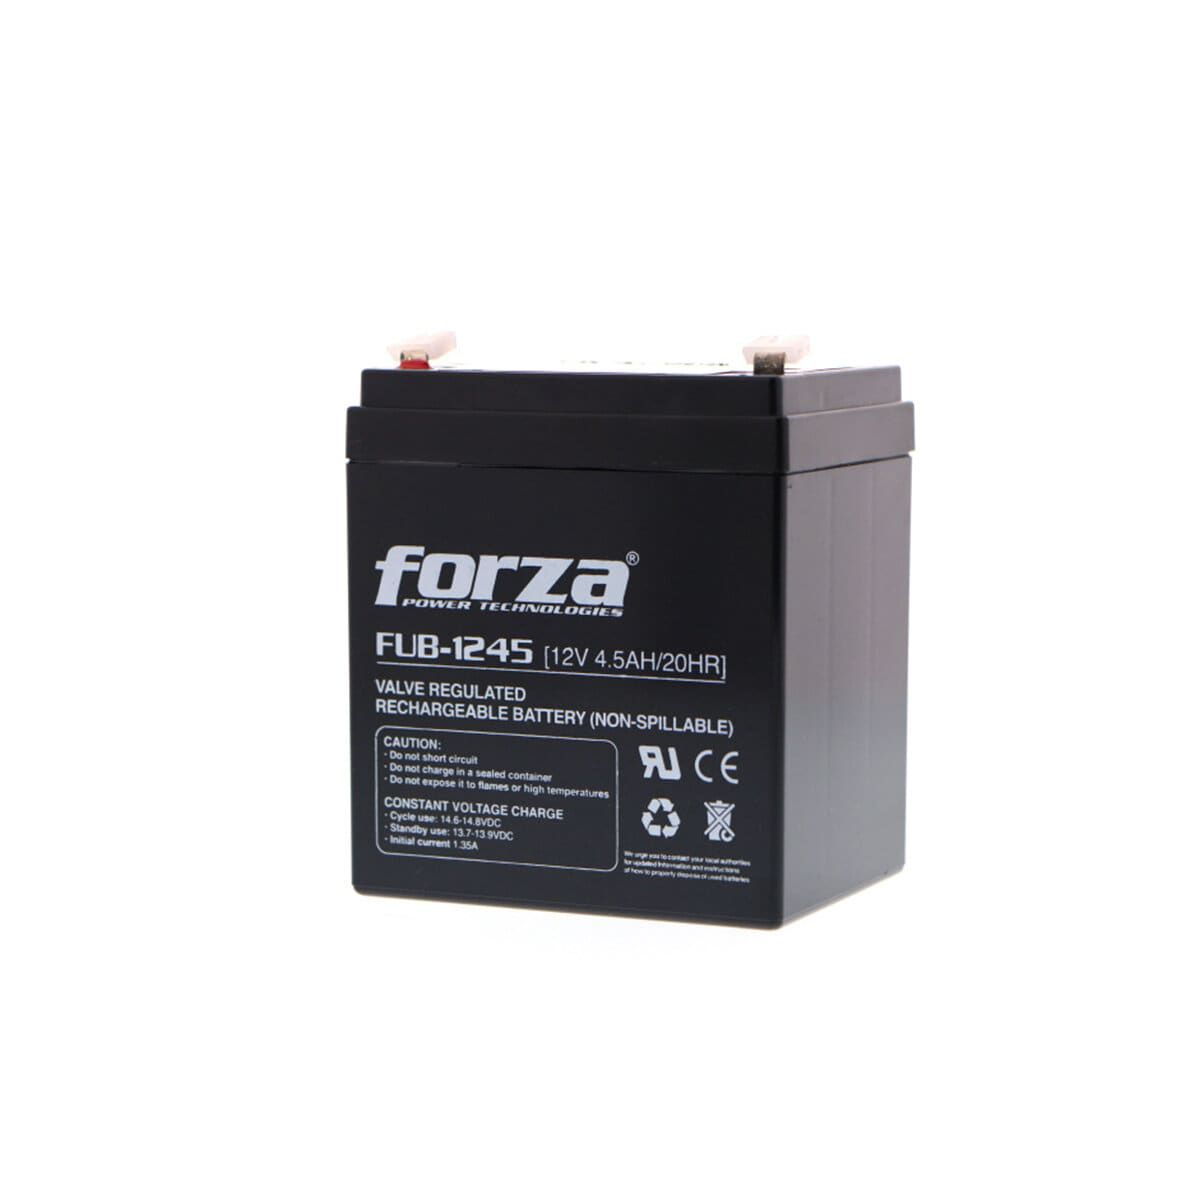 Batería 12V 4.5AH Forza FUB-1245 AGM